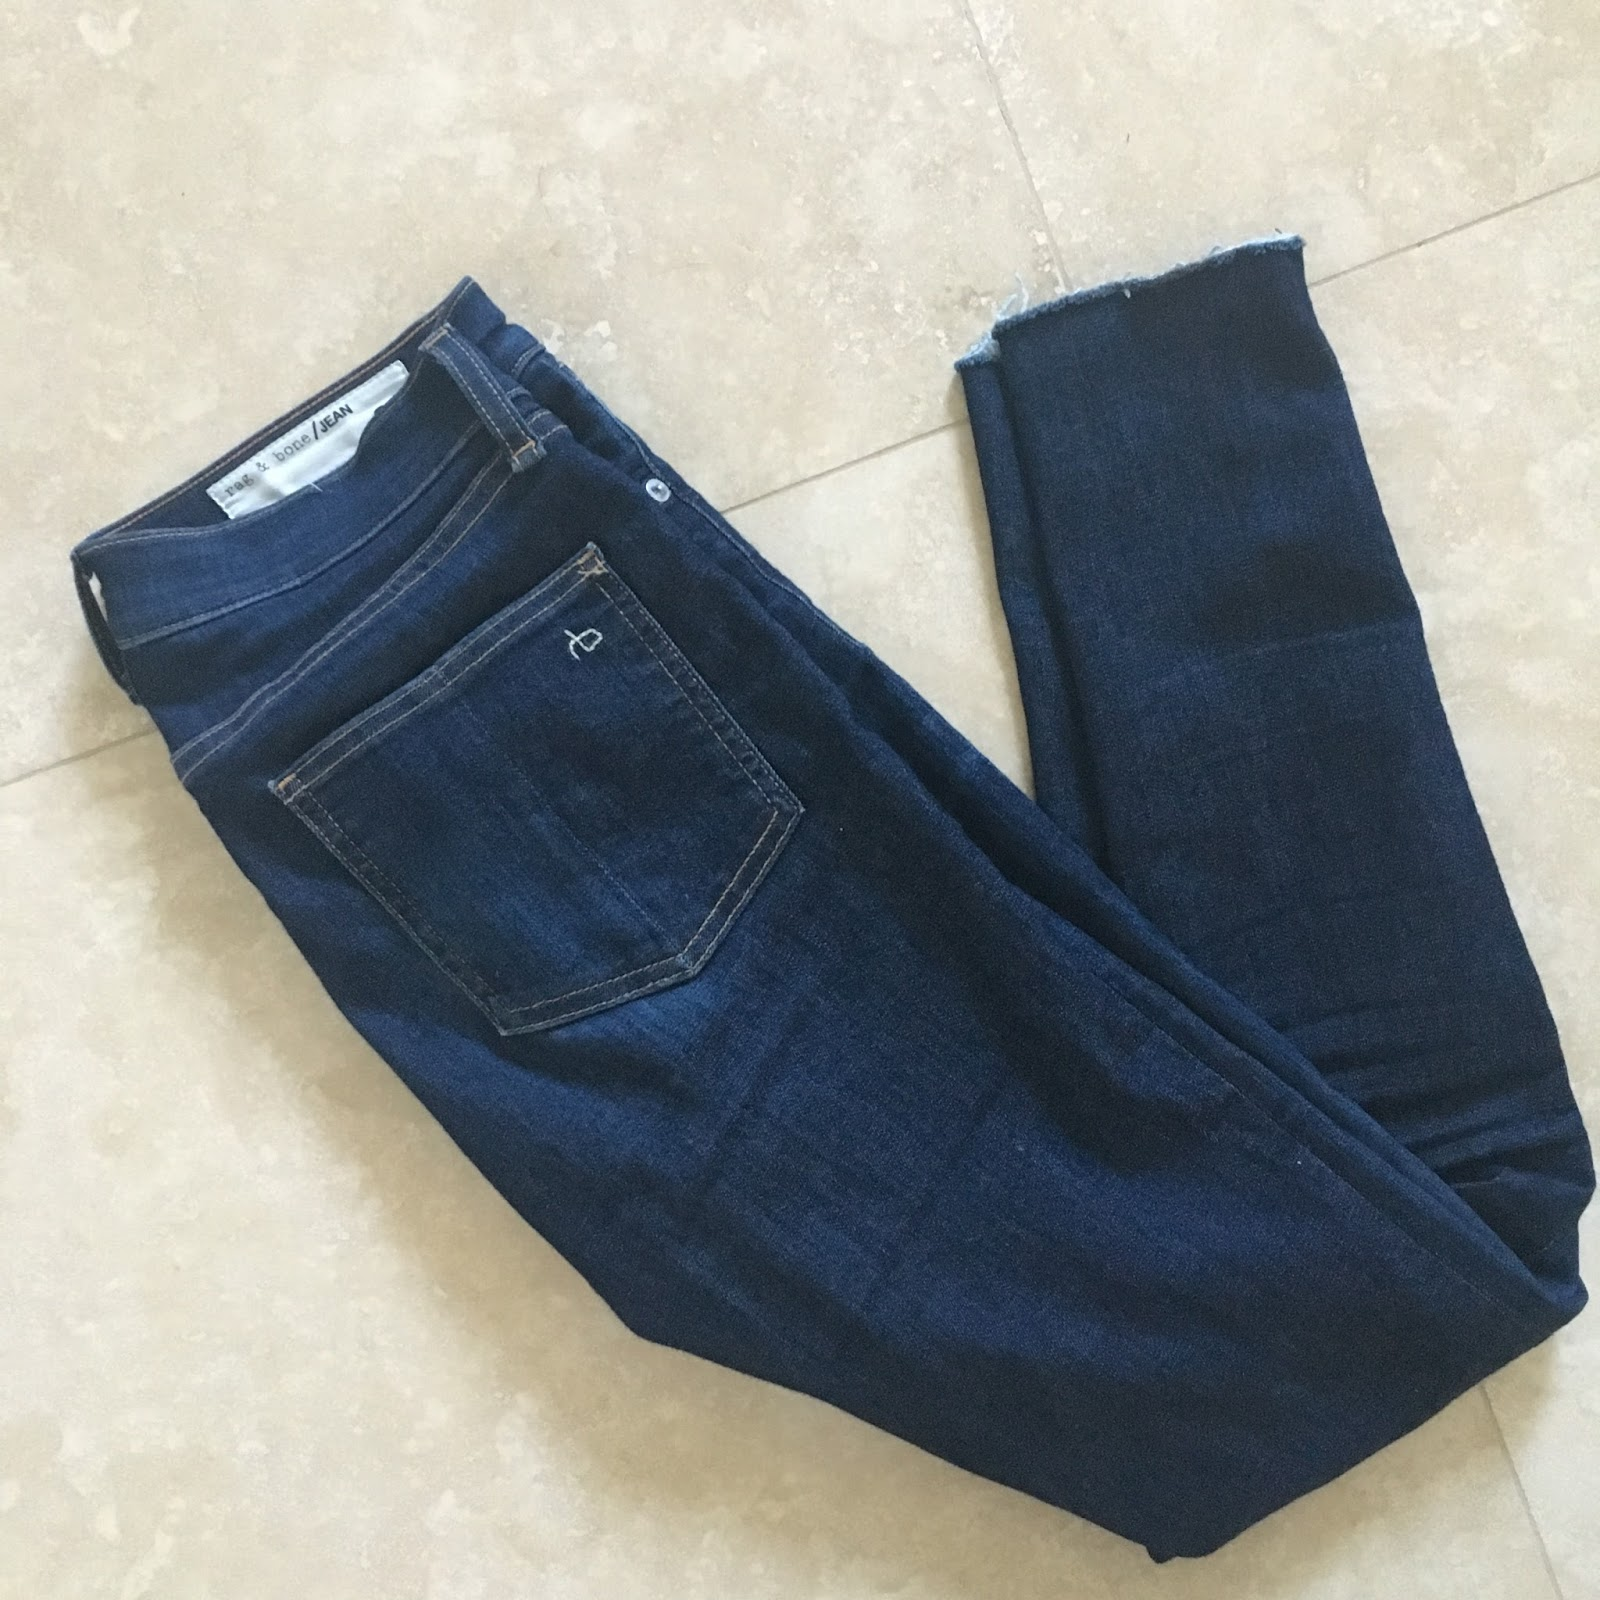 best dark skinny jeans